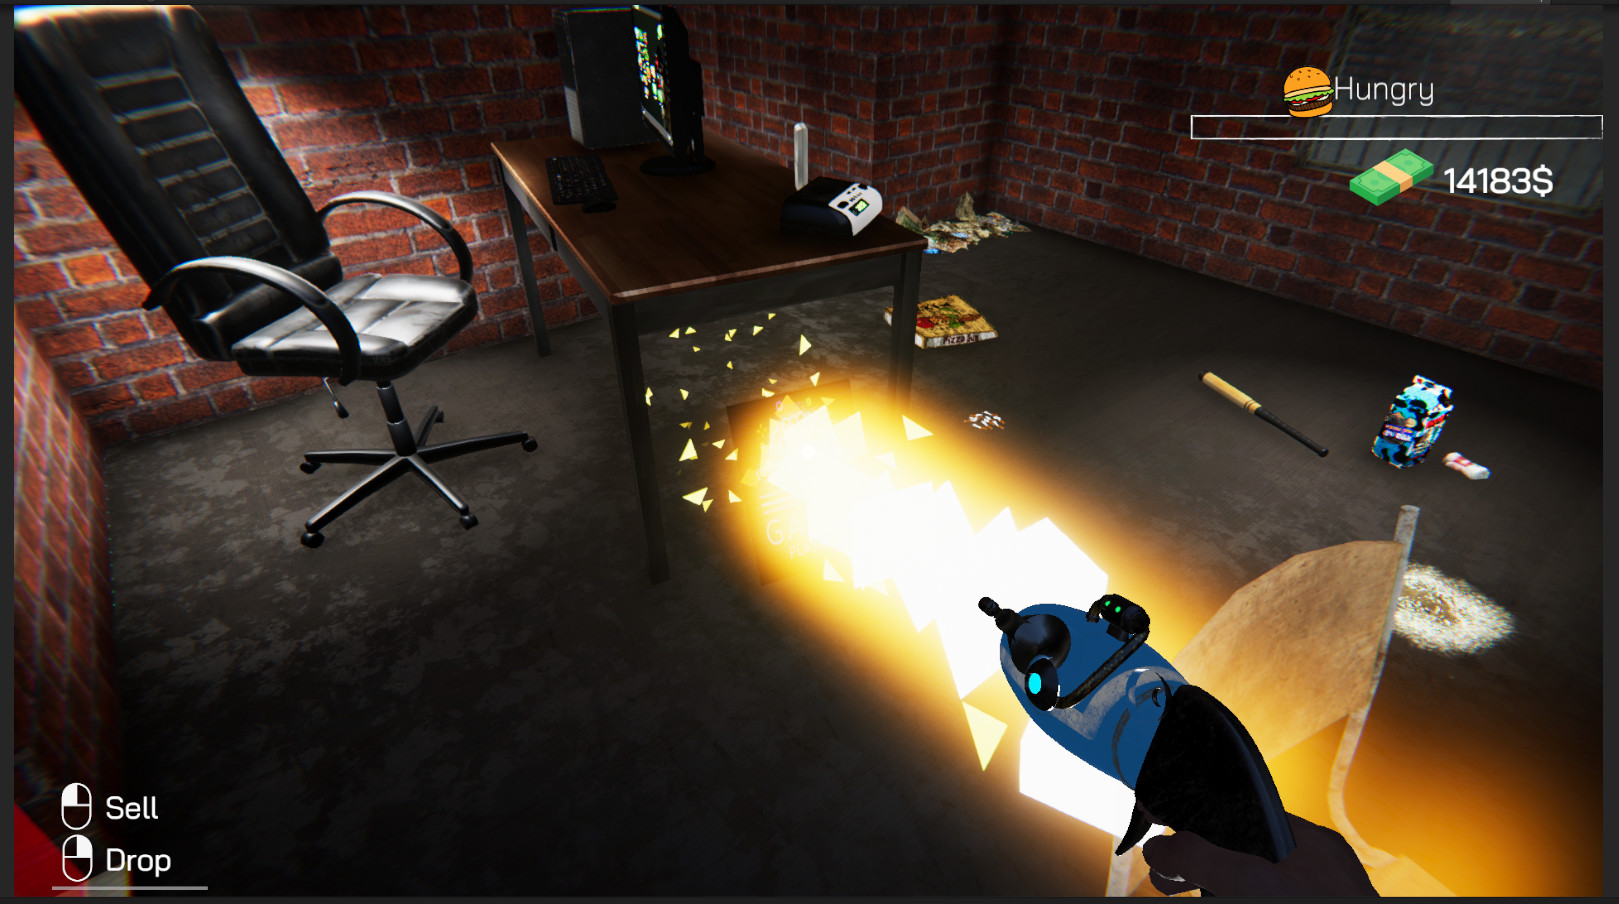 网吧模拟器/网咖模拟器/Internet Cafe Simulator插图9